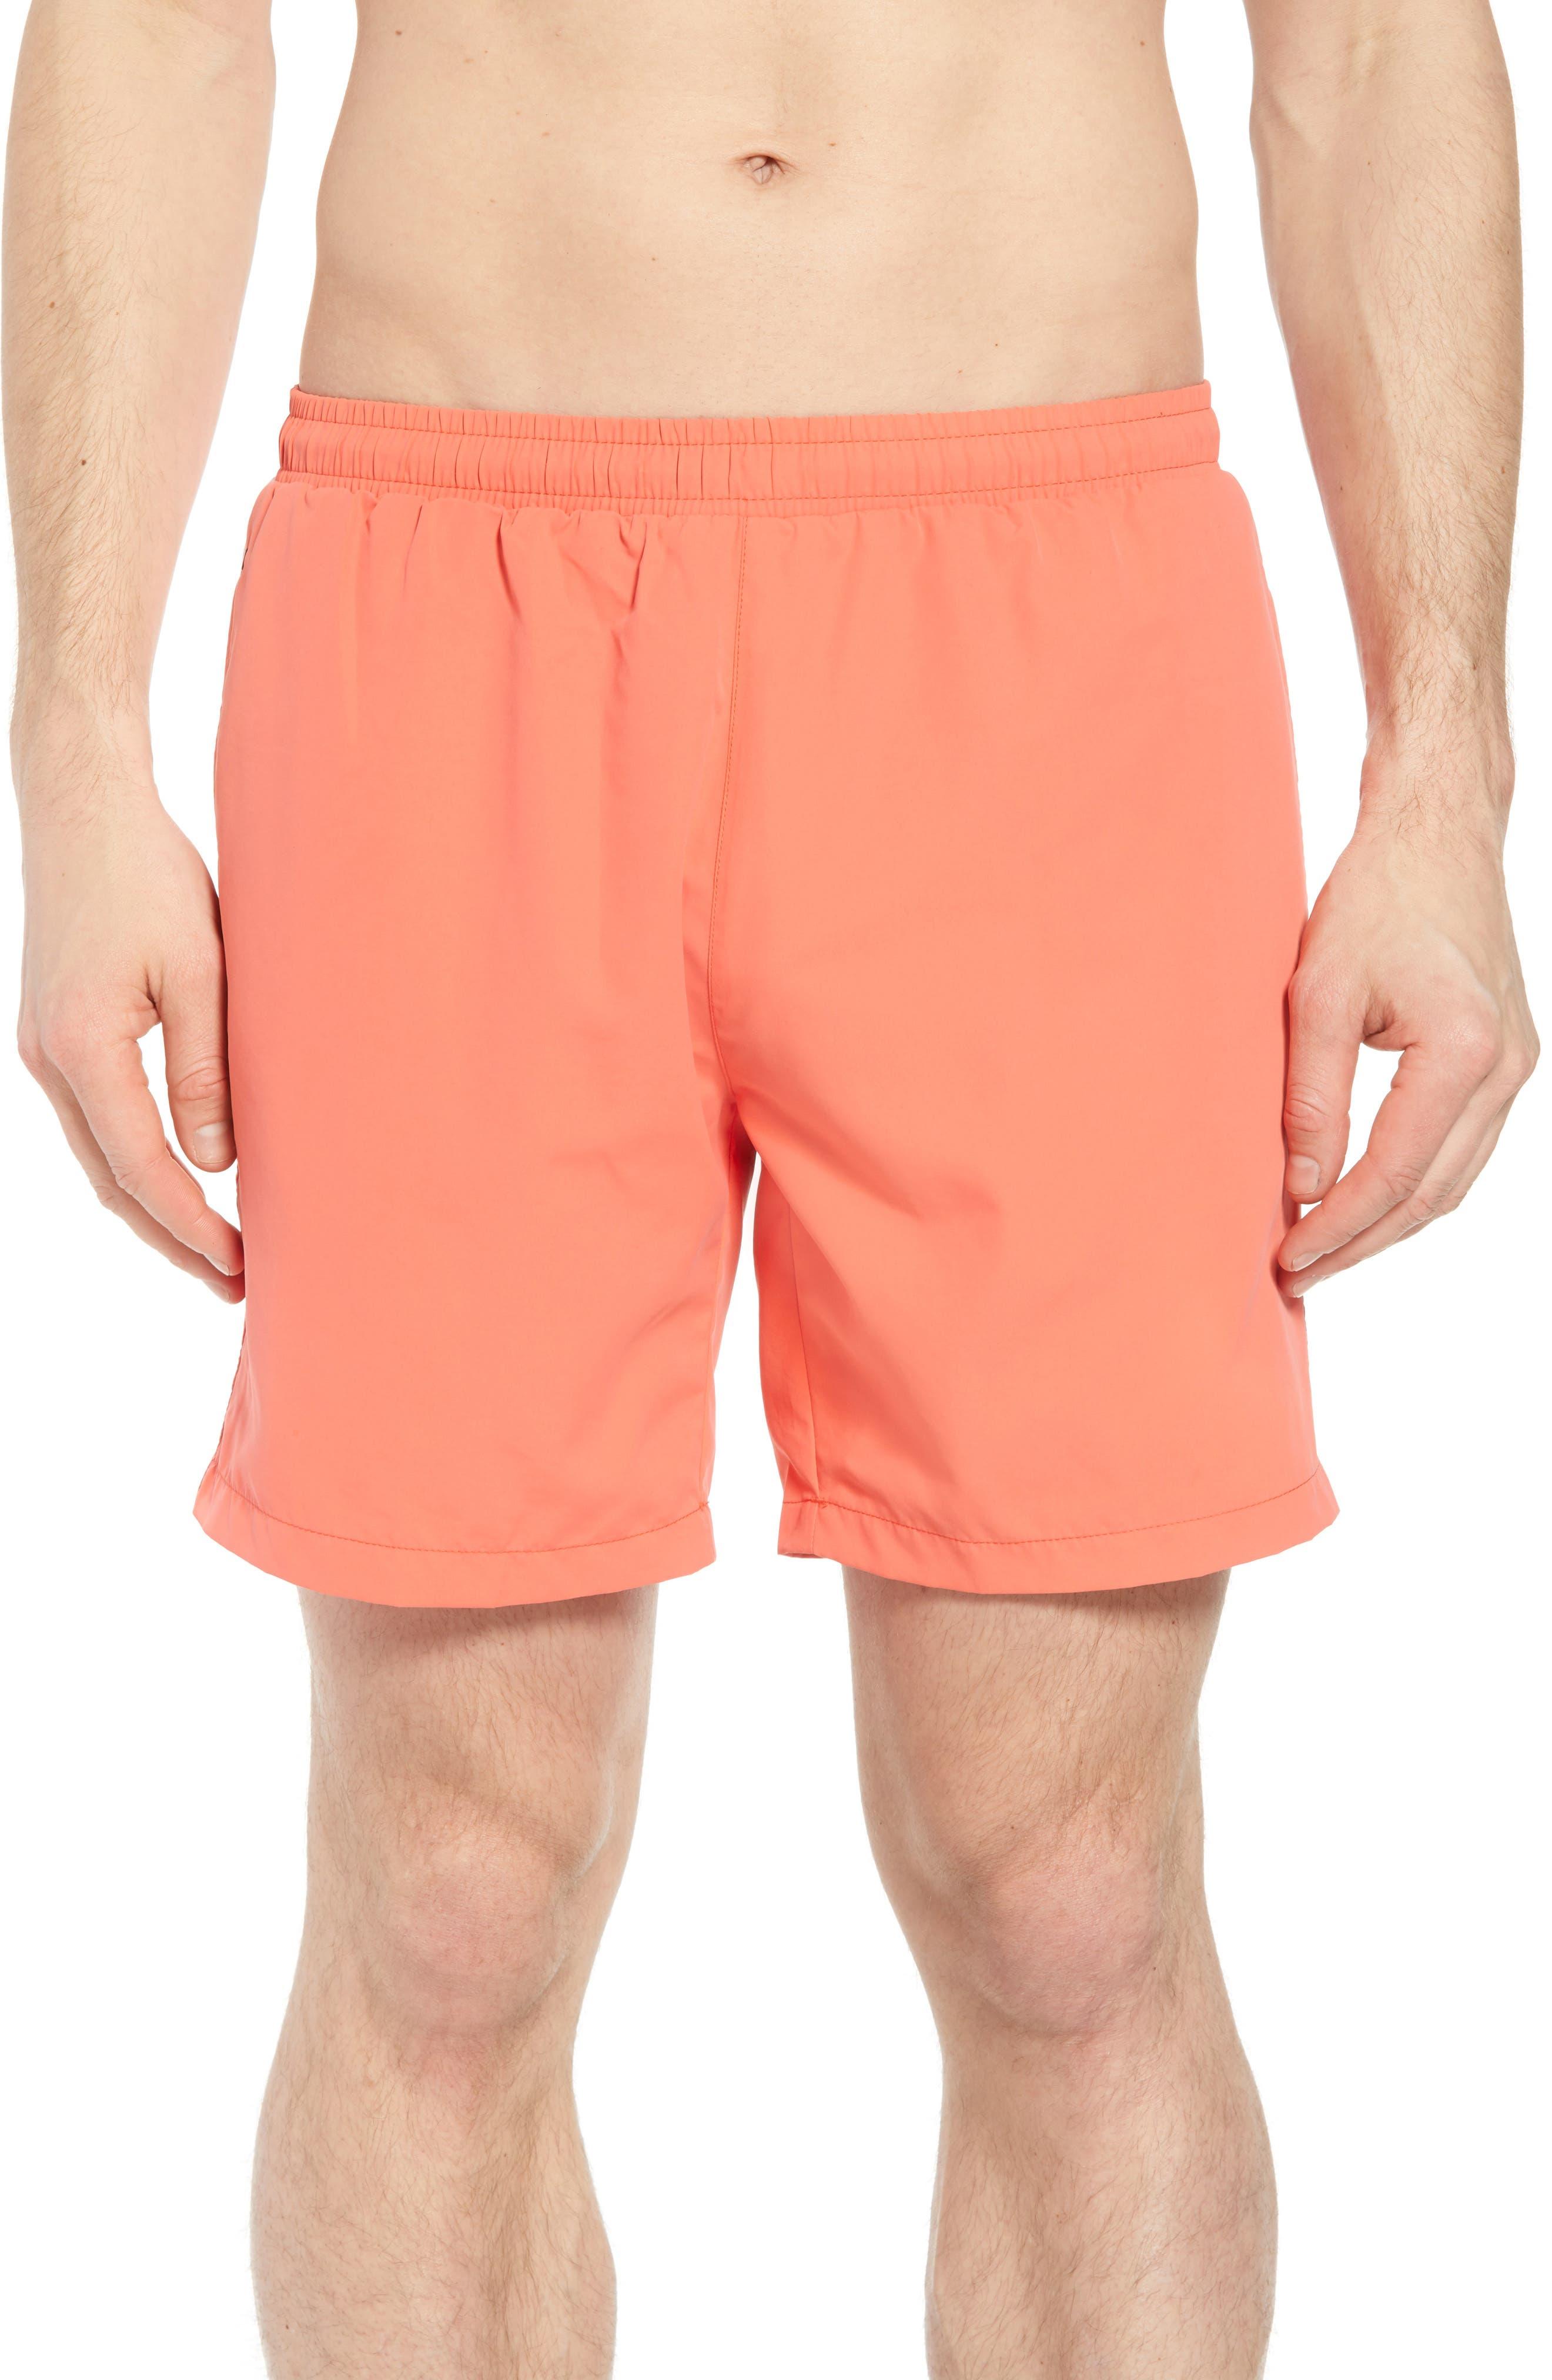 Seabream Regular Fit Stripe Swim Trunks,                             Main thumbnail 1, color,                             Pink